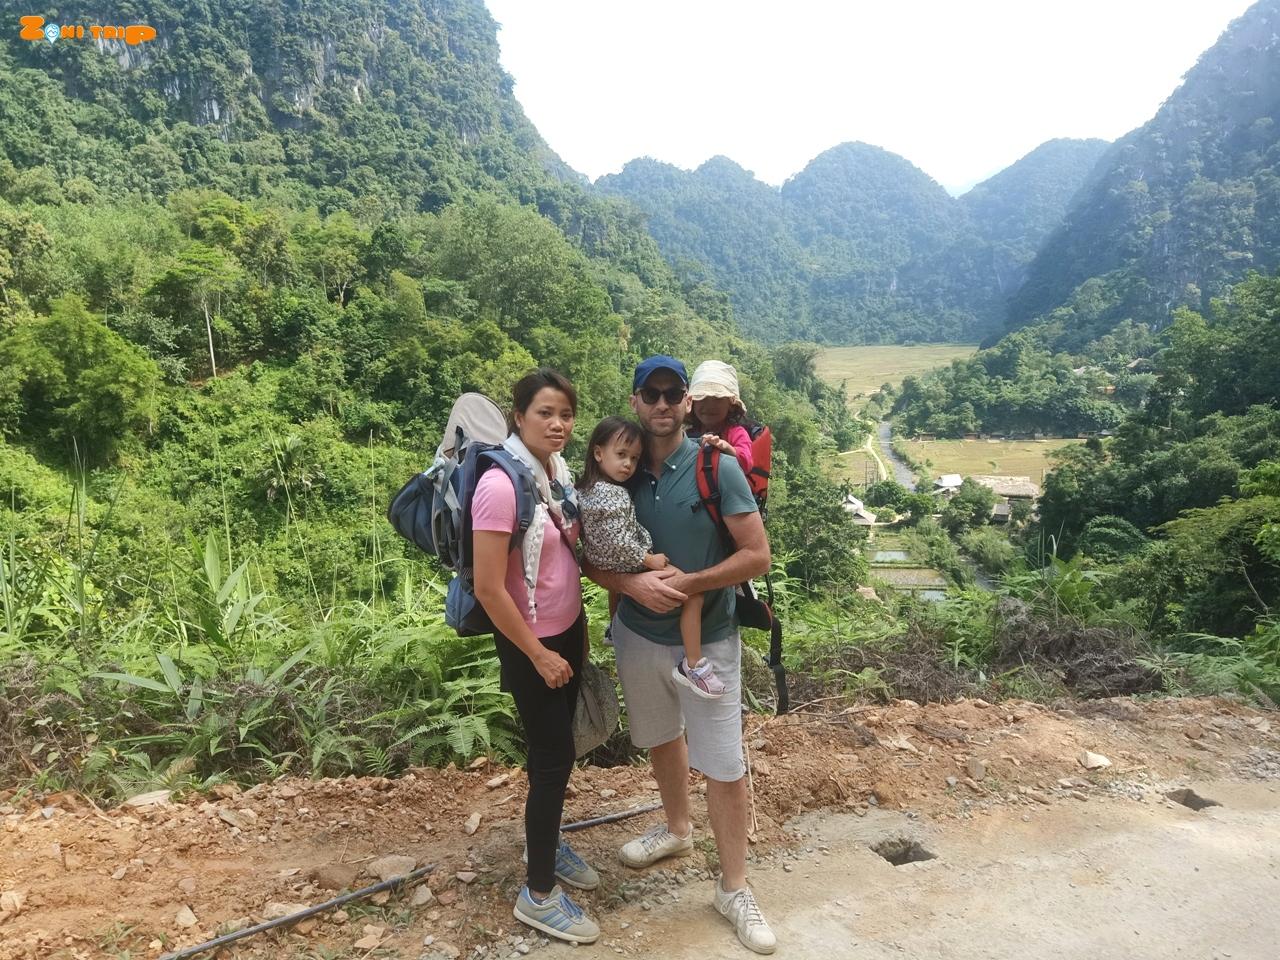 PU luong trekking family tour